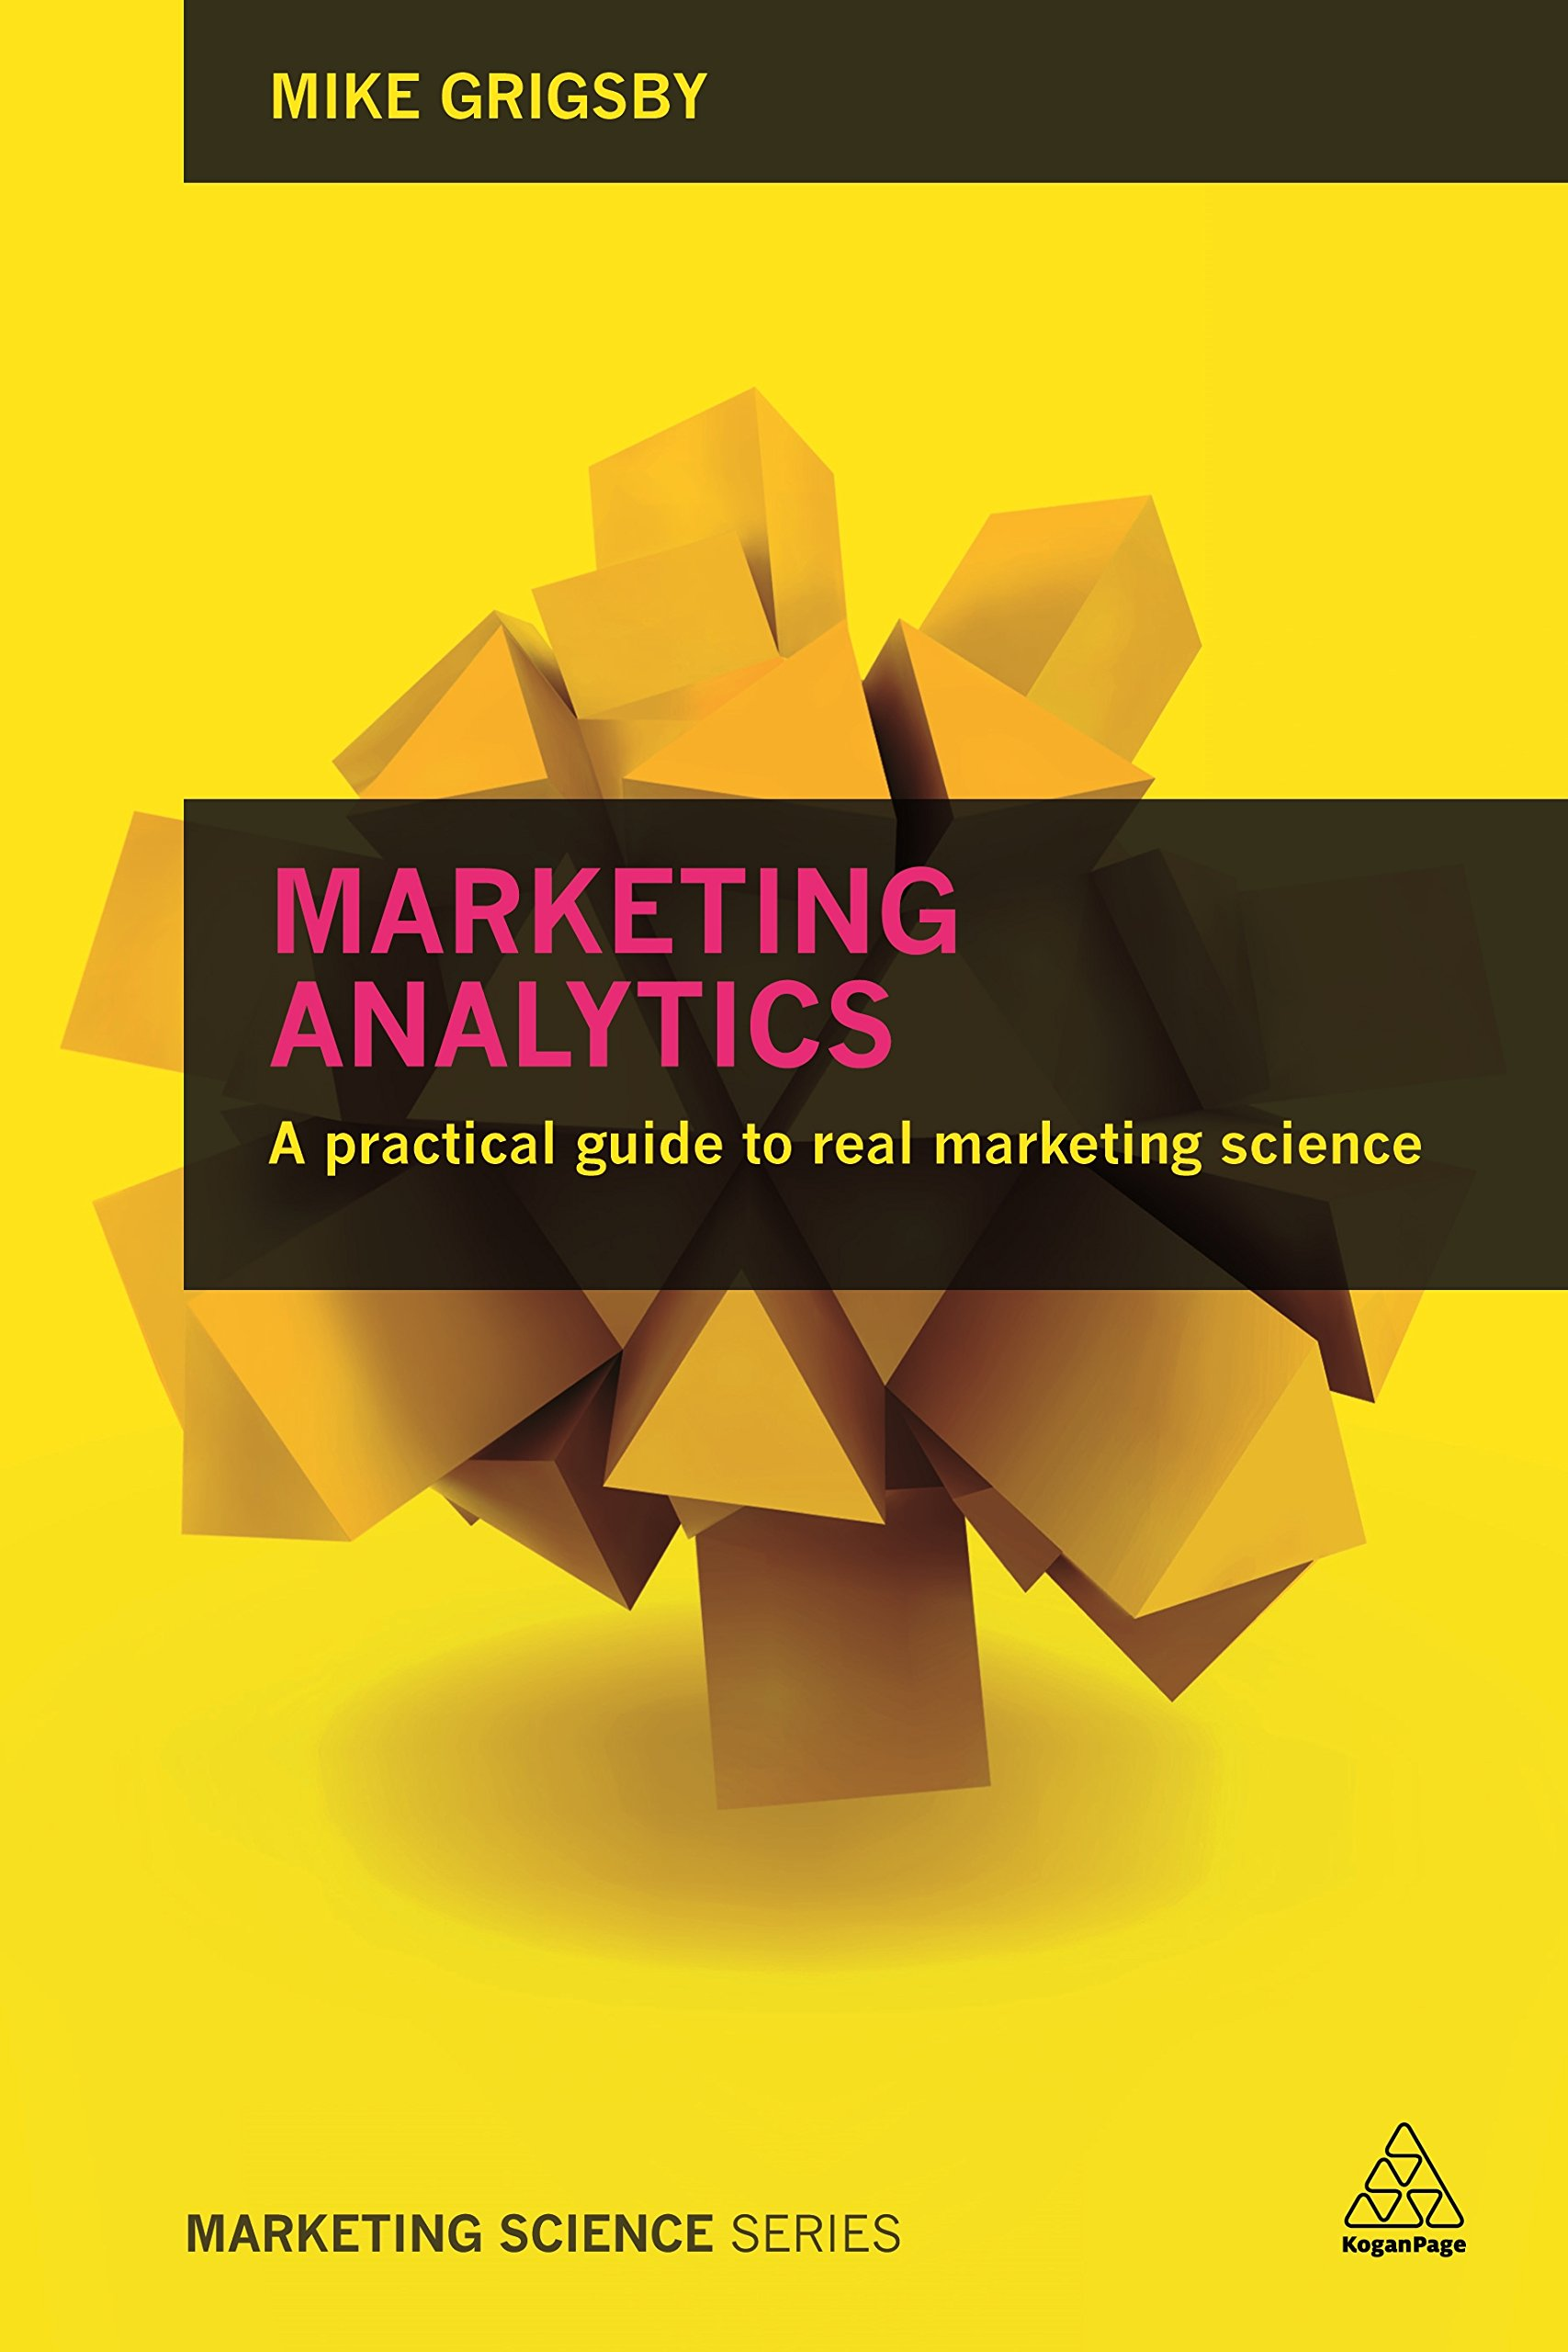 Marketing Analytics: A Practical Guide to Real Marketing Science: Amazon.es: Mike Grigsby: Libros en idiomas extranjeros